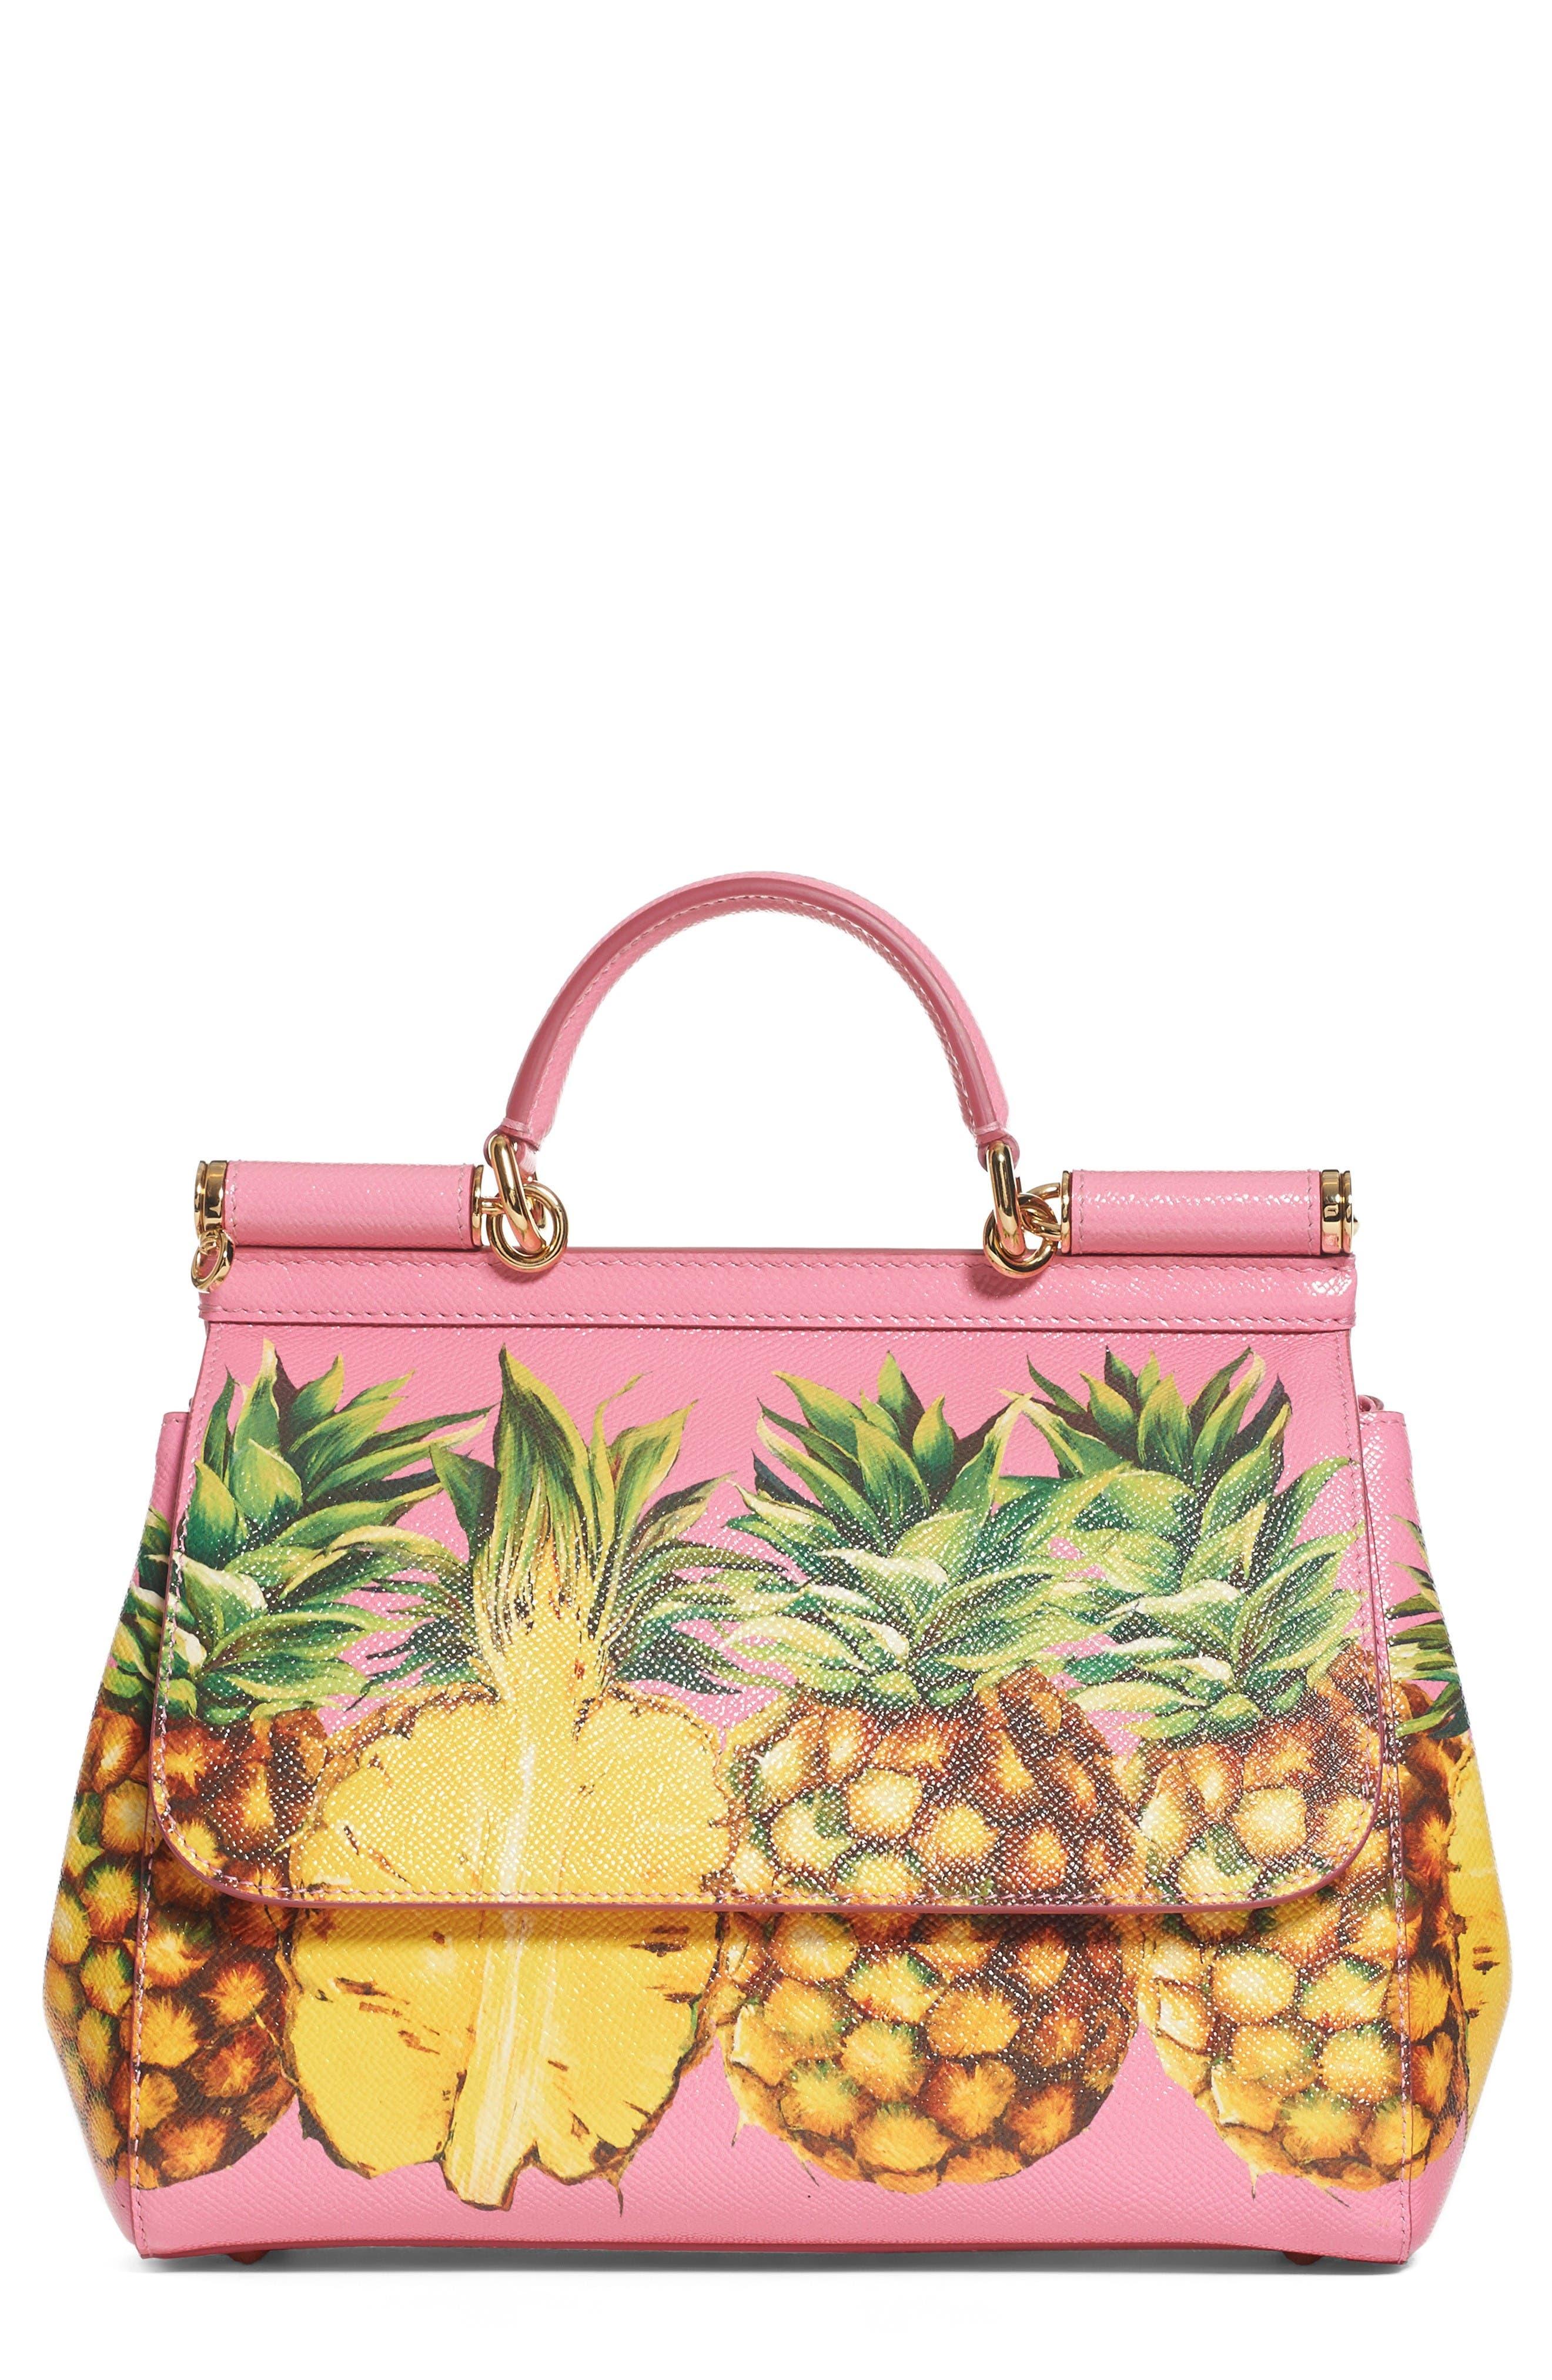 Alternate Image 1 Selected - Dolce&Gabbana Miss Sicily Pineapple Leather Satchel